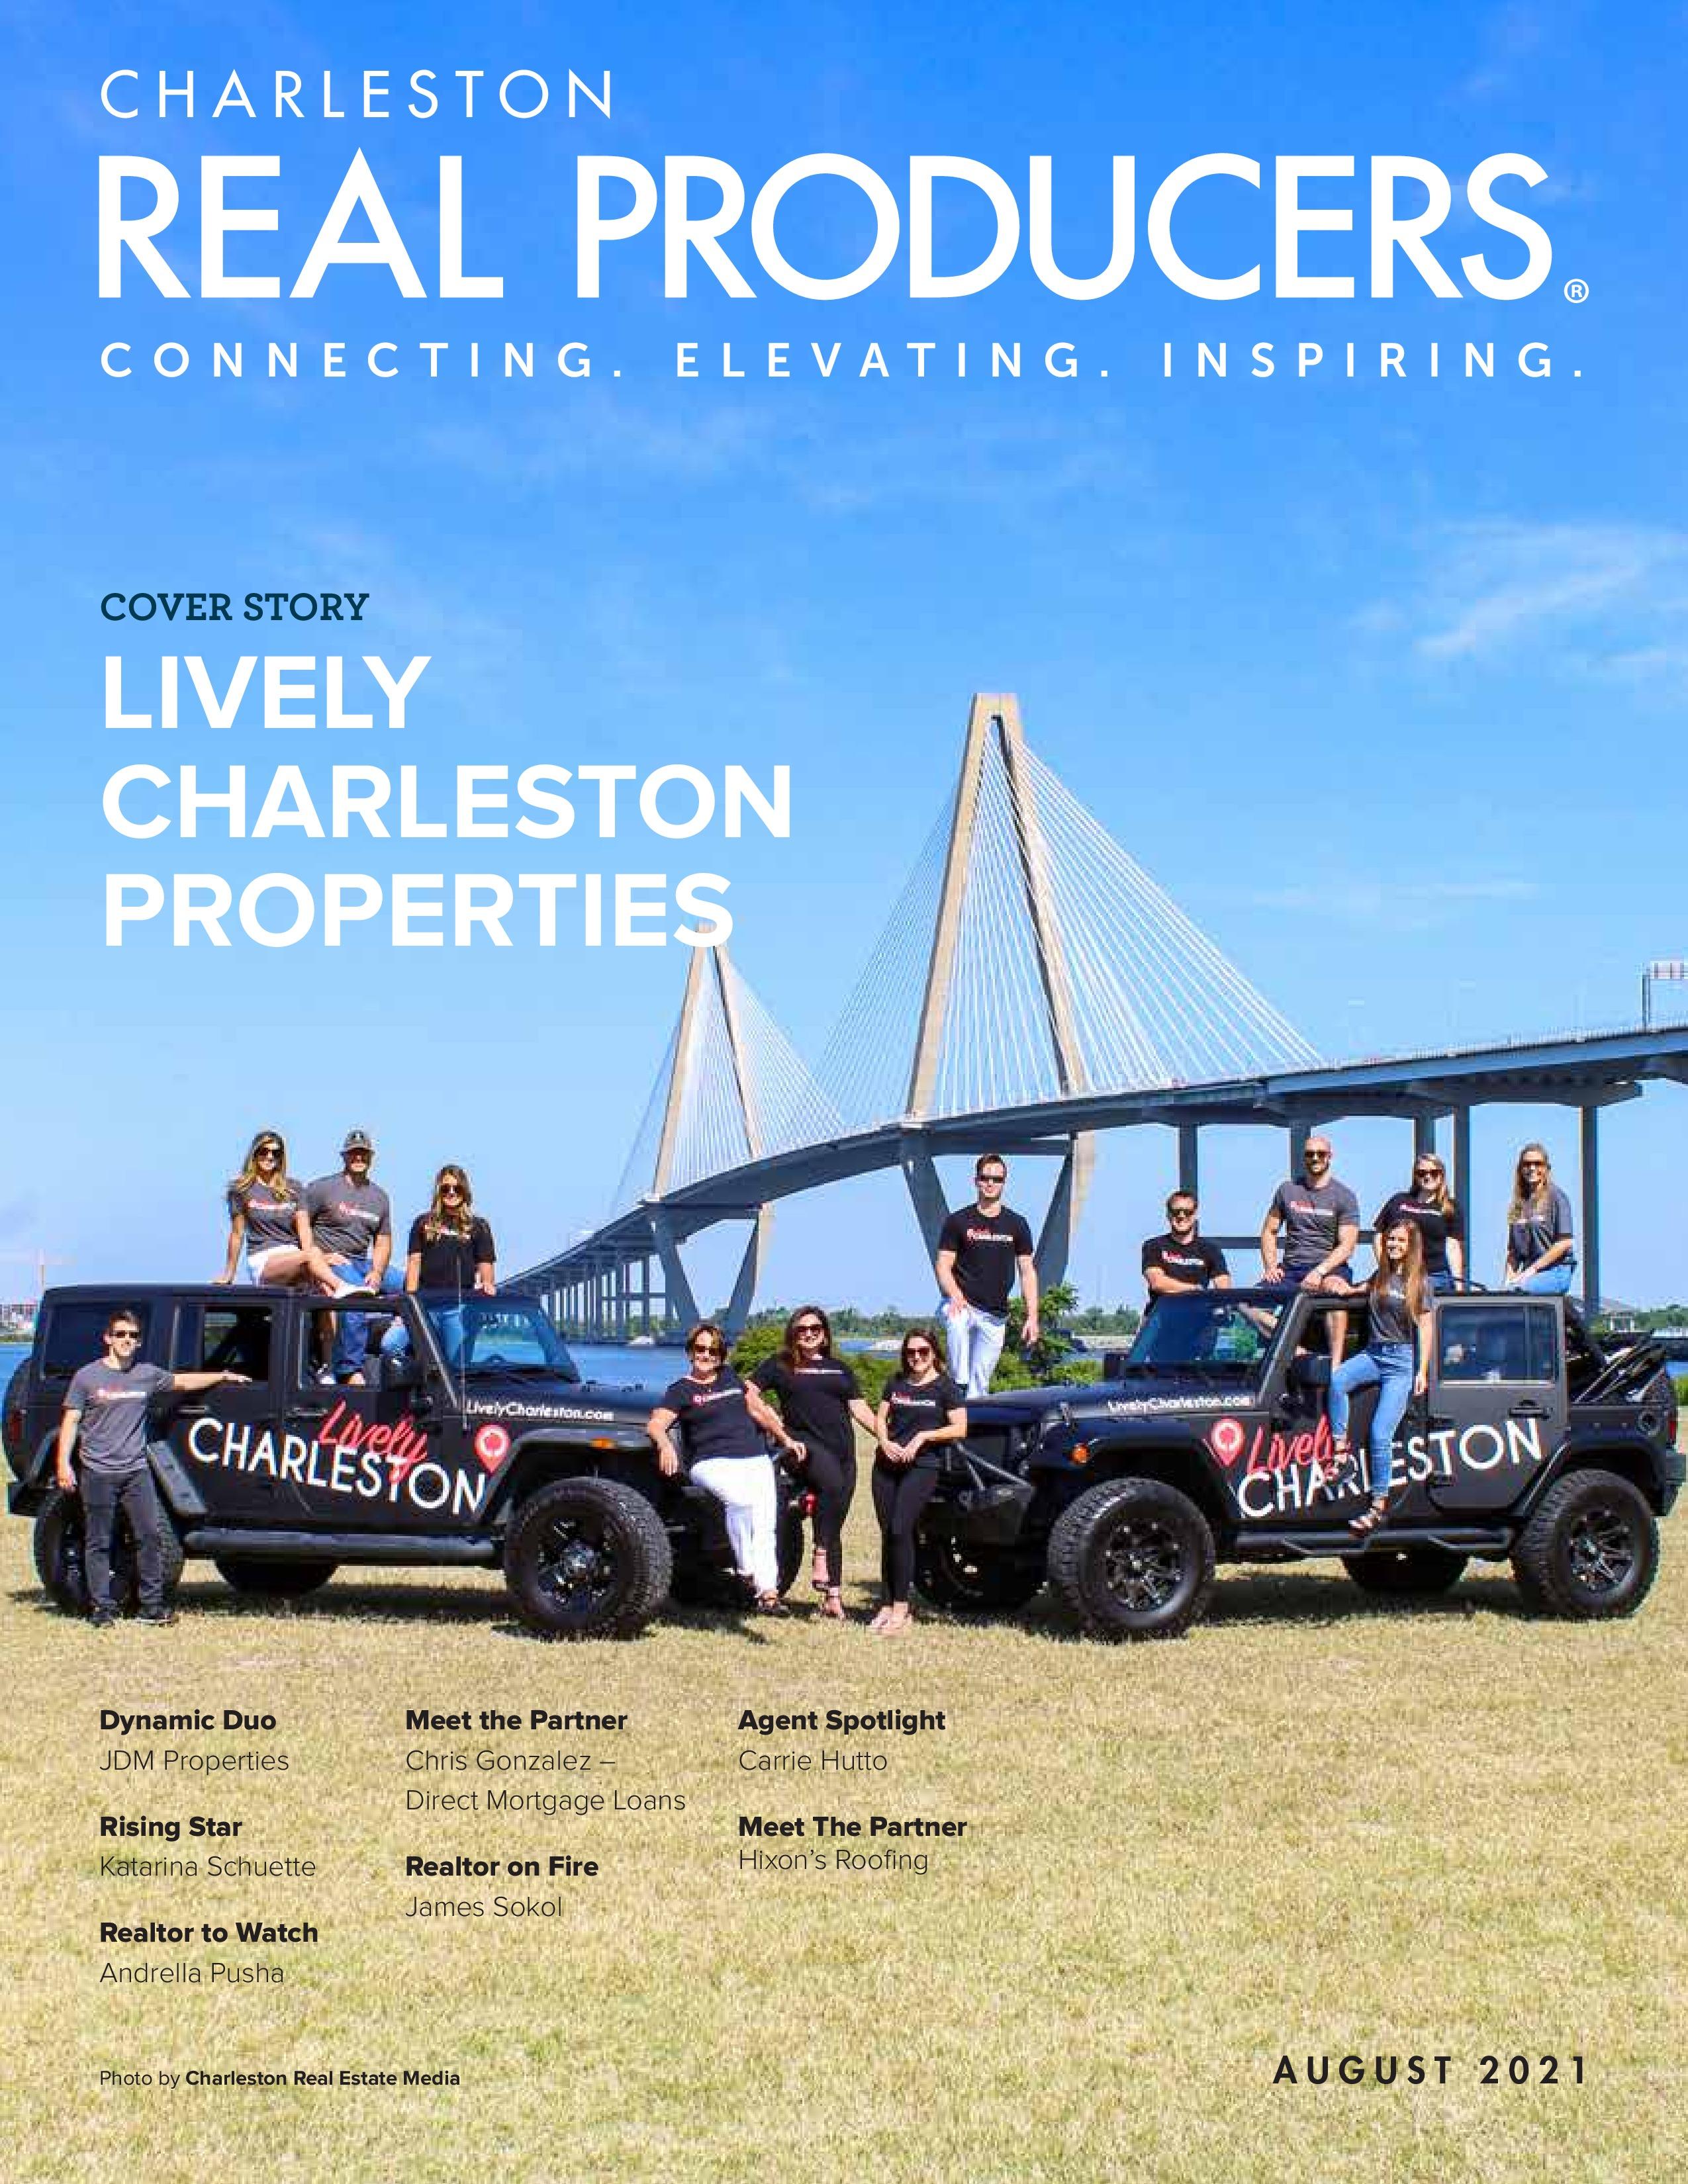 Charleston Real Producers 2021-08-01